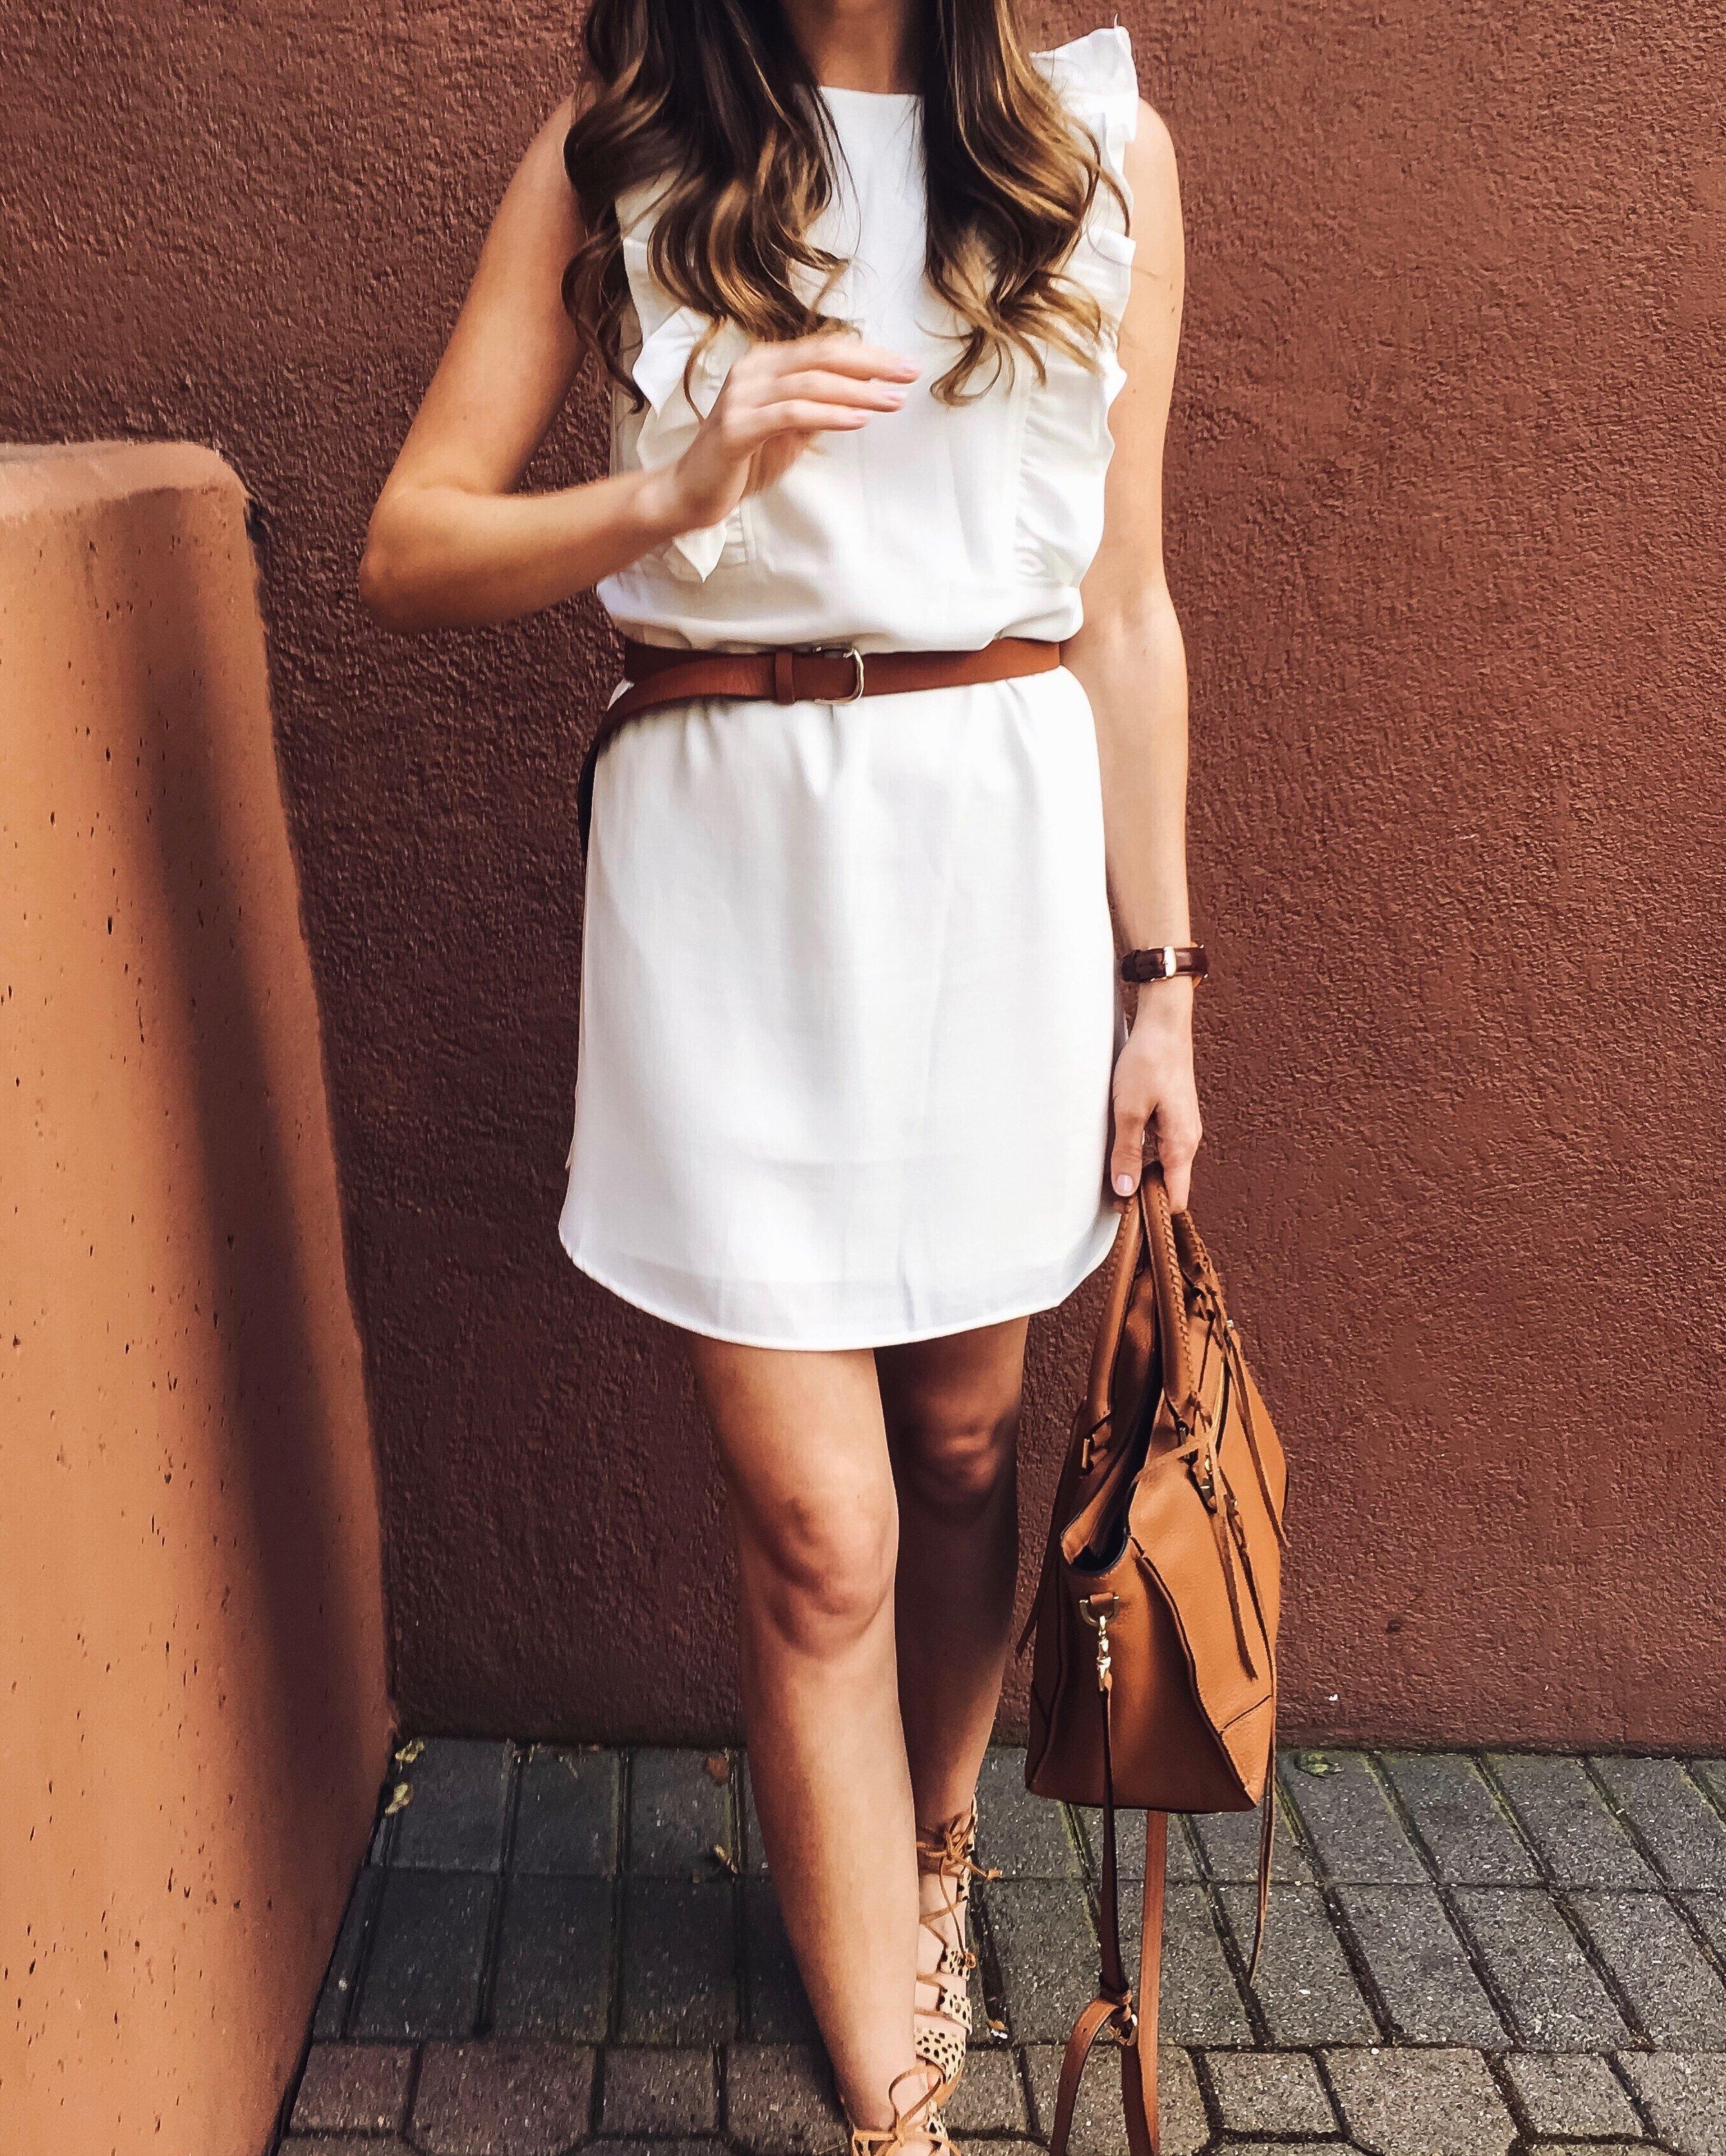 Shop the Look Below.  Nordstrom Dress  |  Dolce Vita Sandals  |  Rebecca Minkoff Bag  |  Nordstrom Belt  |  Ray-Ban Sunglasses